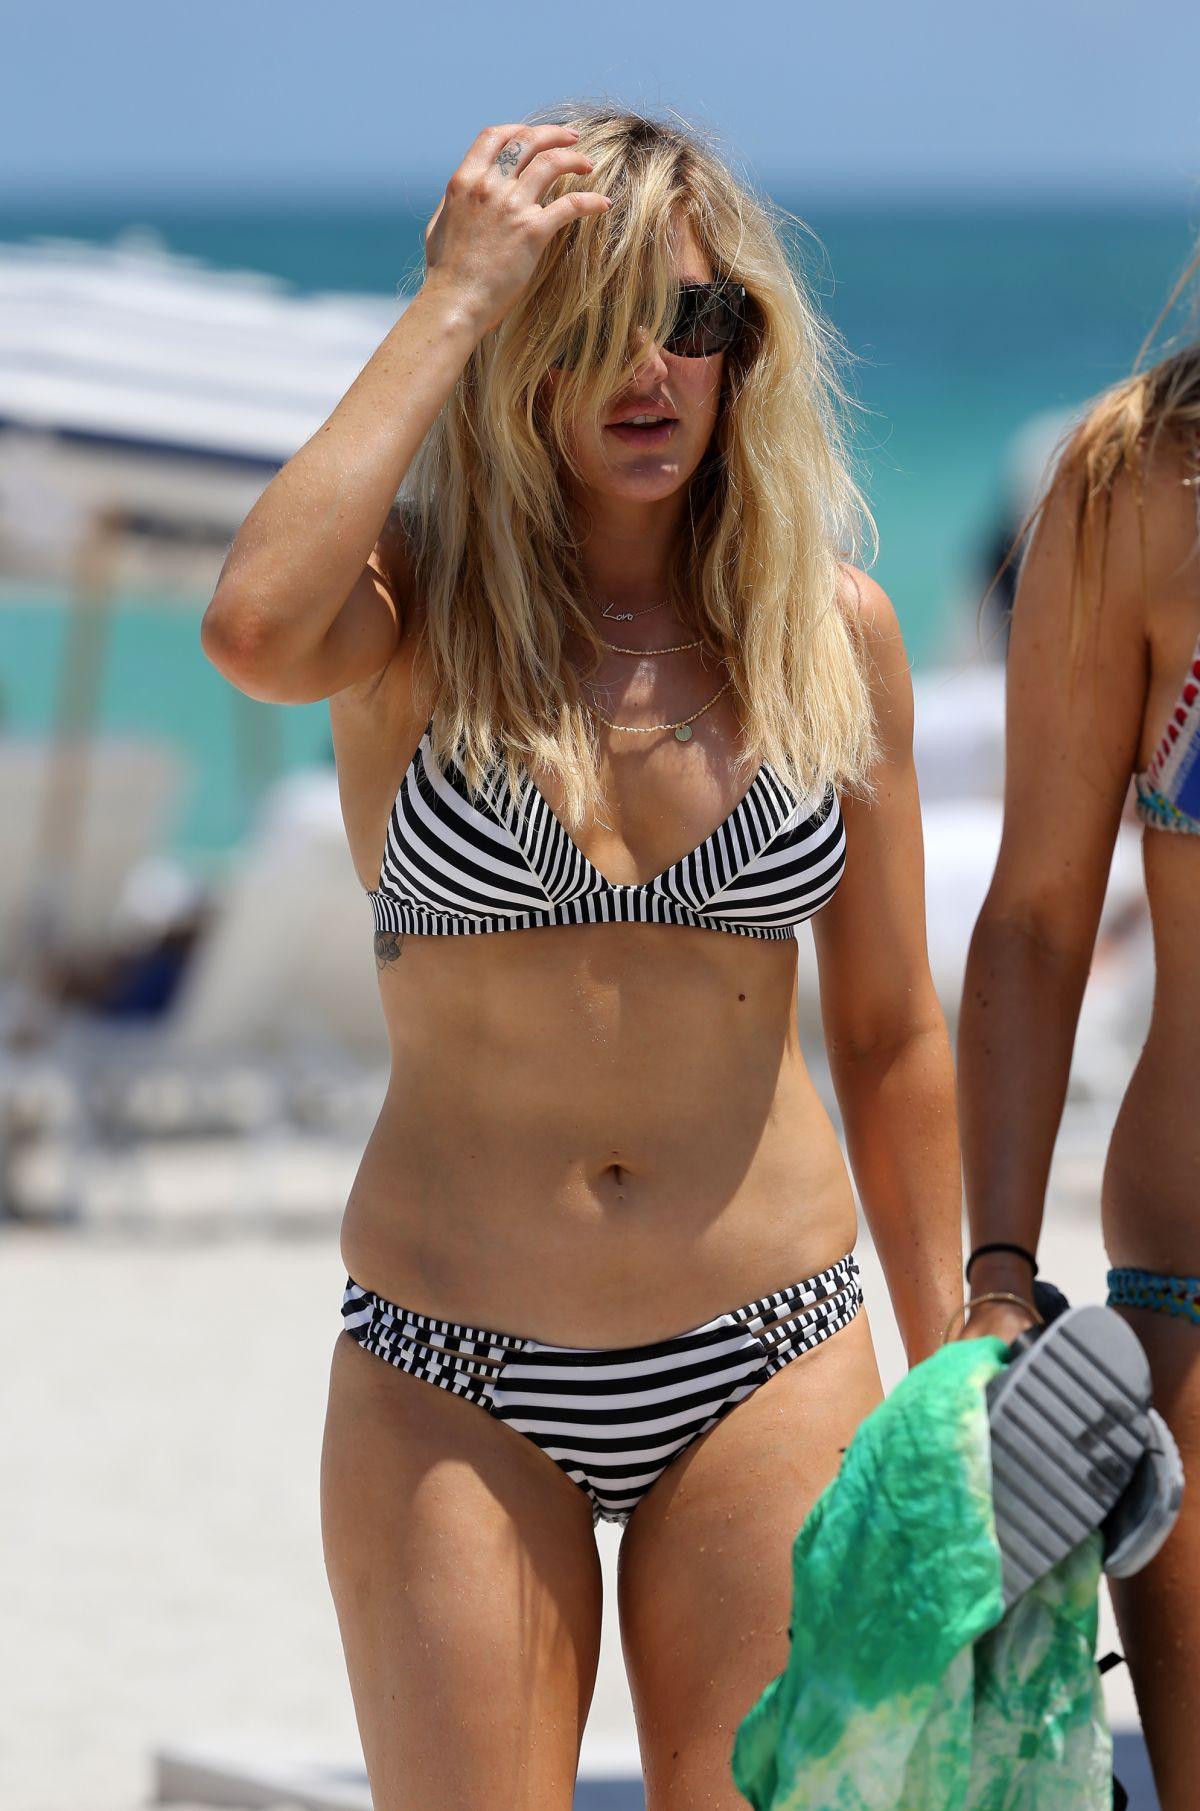 Bikini Ellie Goulding nudes (38 photos), Tits, Hot, Twitter, cameltoe 2015